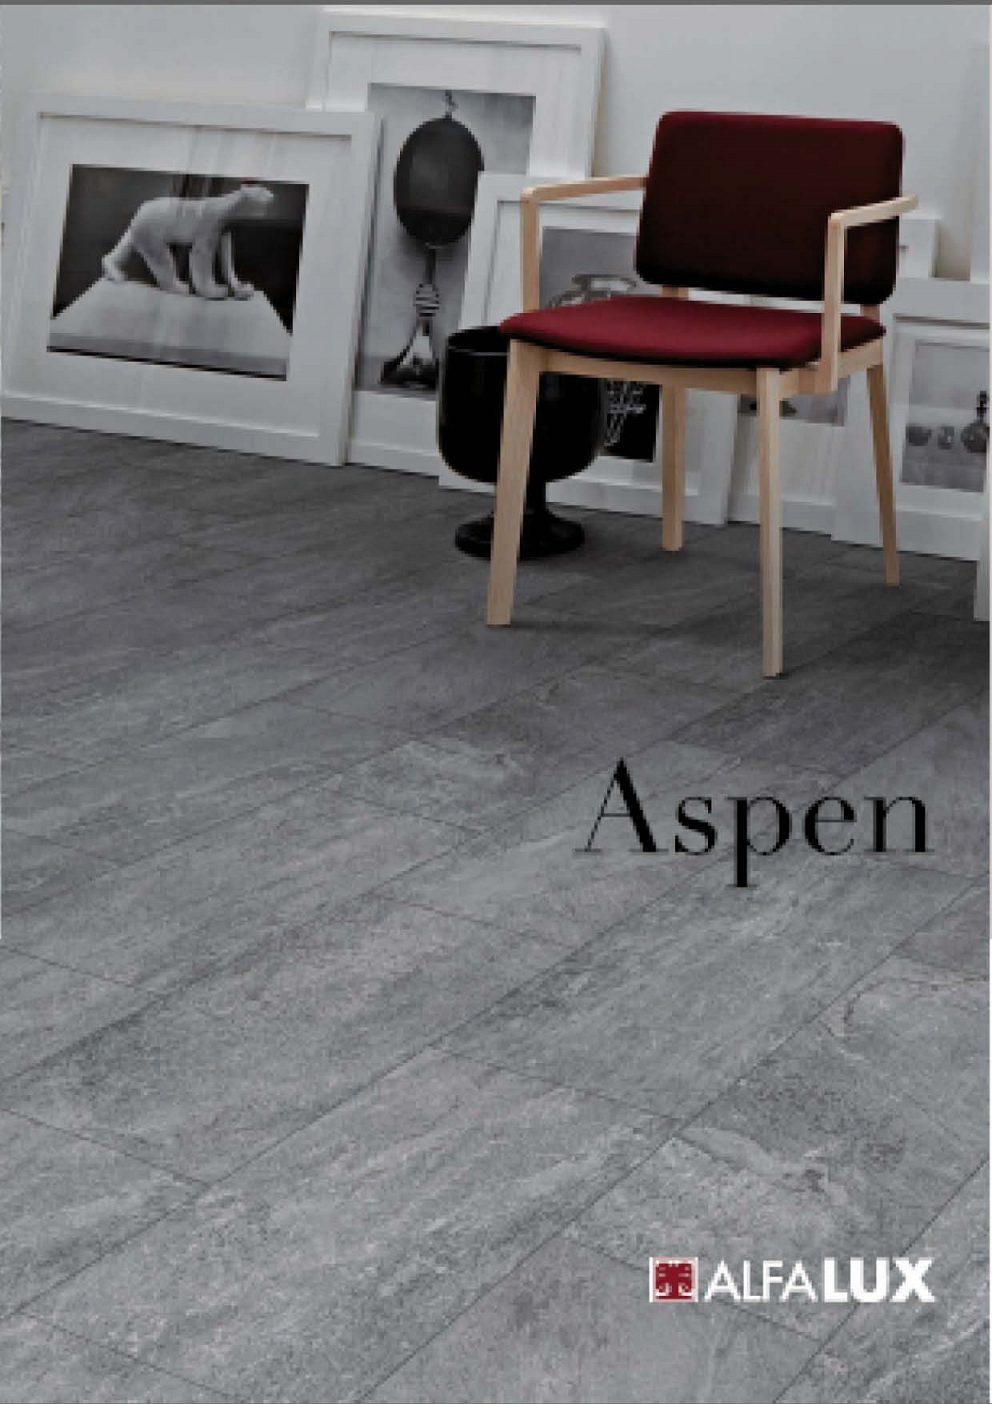 Alfalux- Aspen